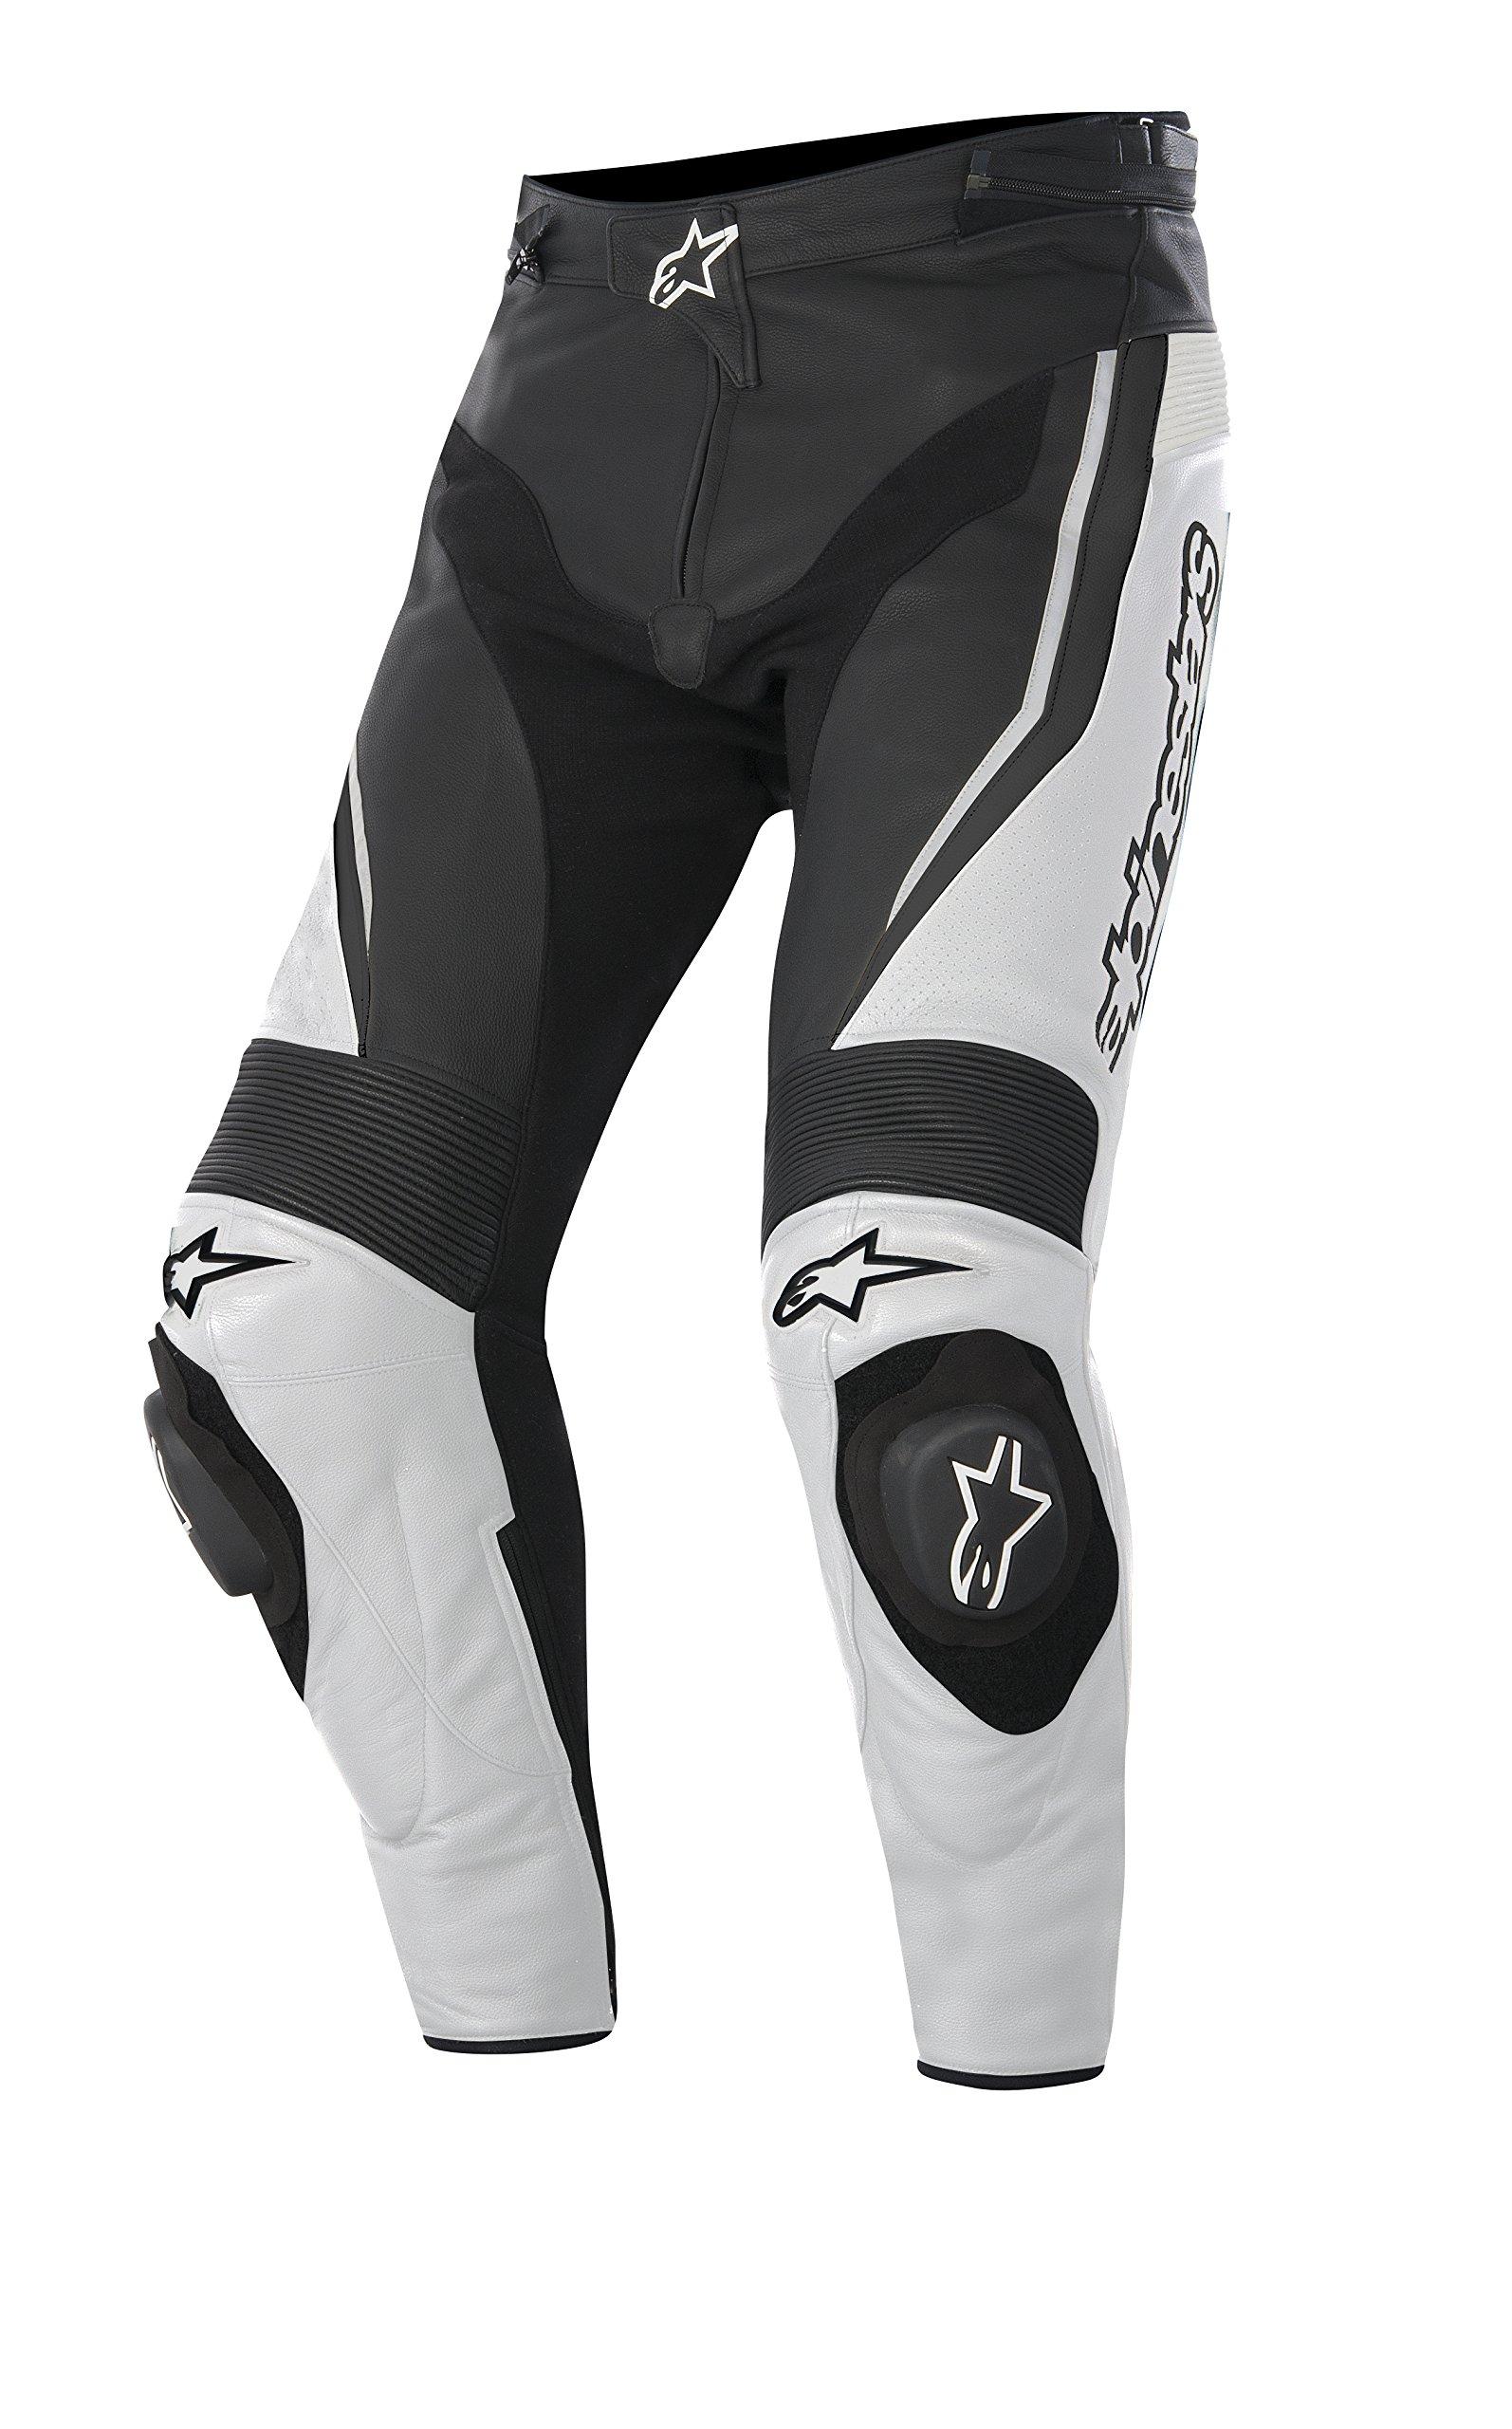 Alpinestars Track Men's Sports Bike Motorcycle Pants - White/Black / Size 50